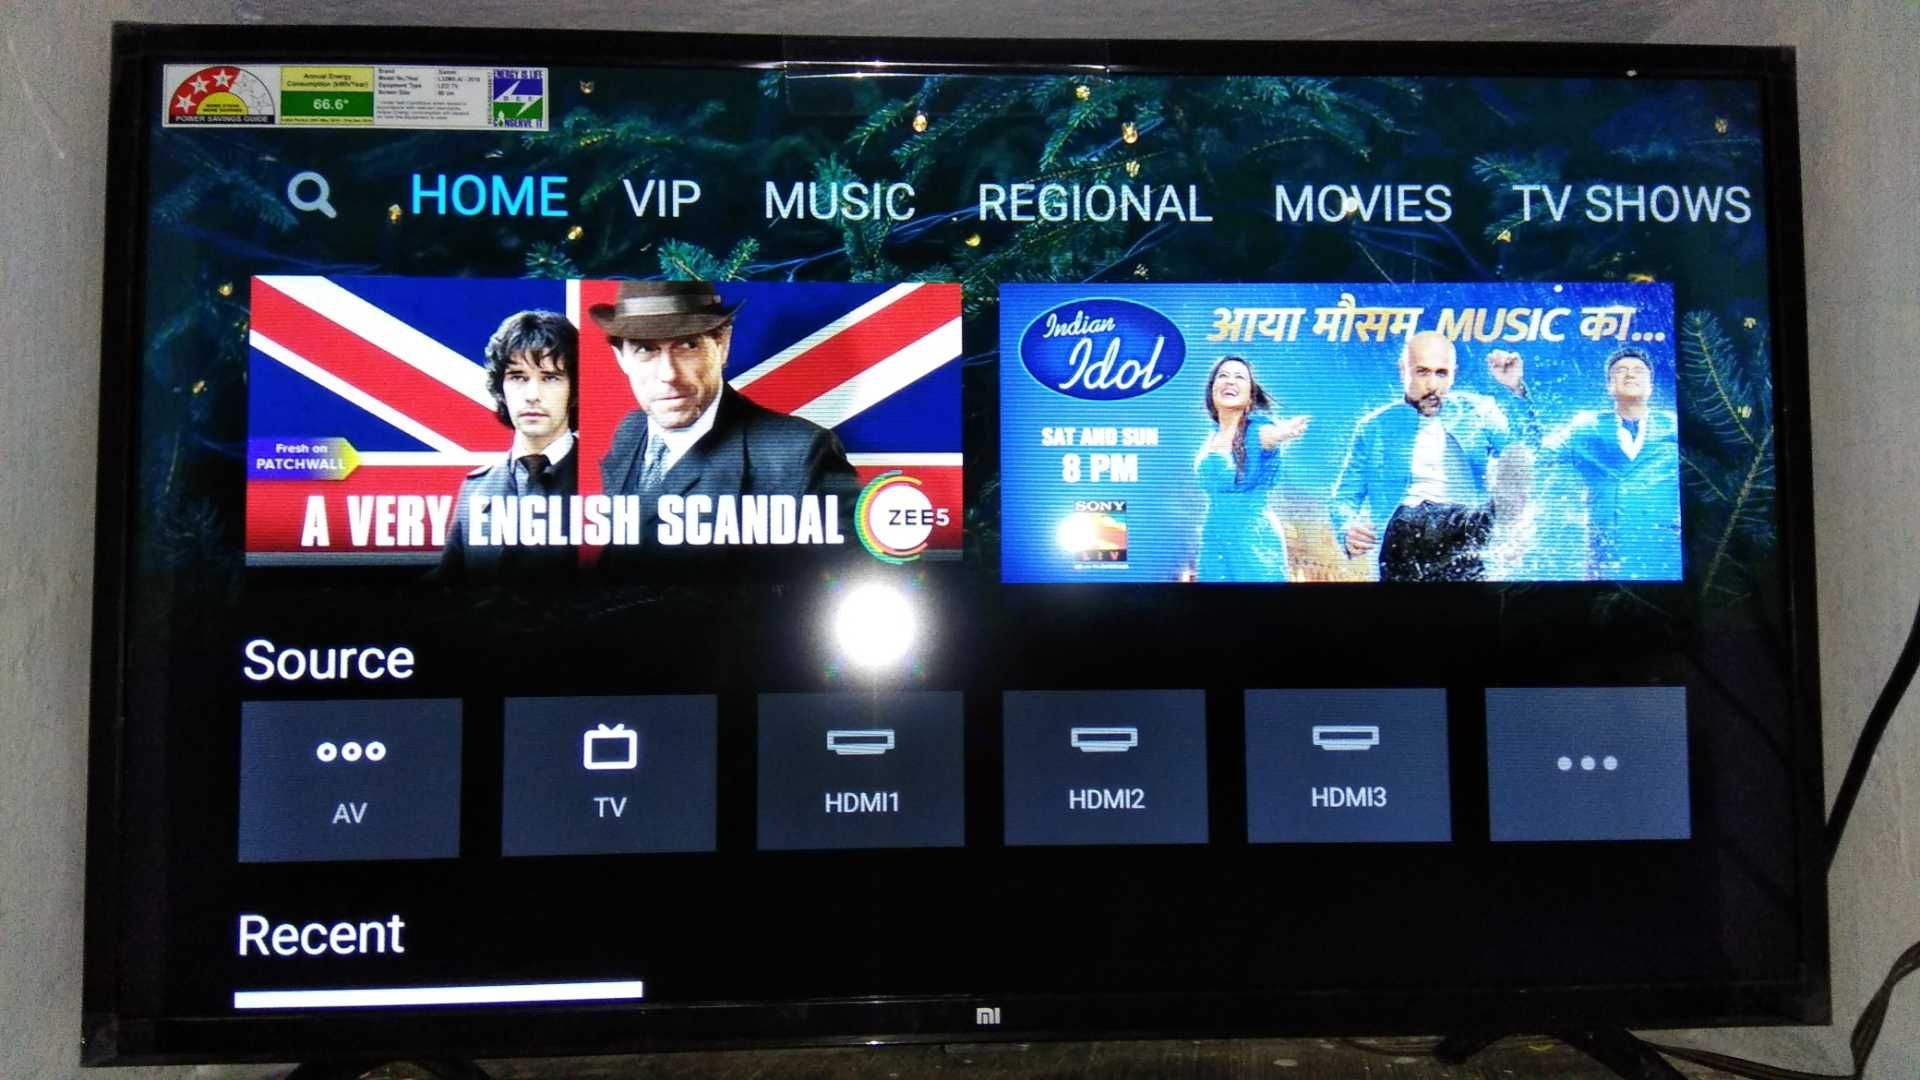 Xiaomi Mi LED Smart TV 4A 32-inch Best Price in India 2019, Specs